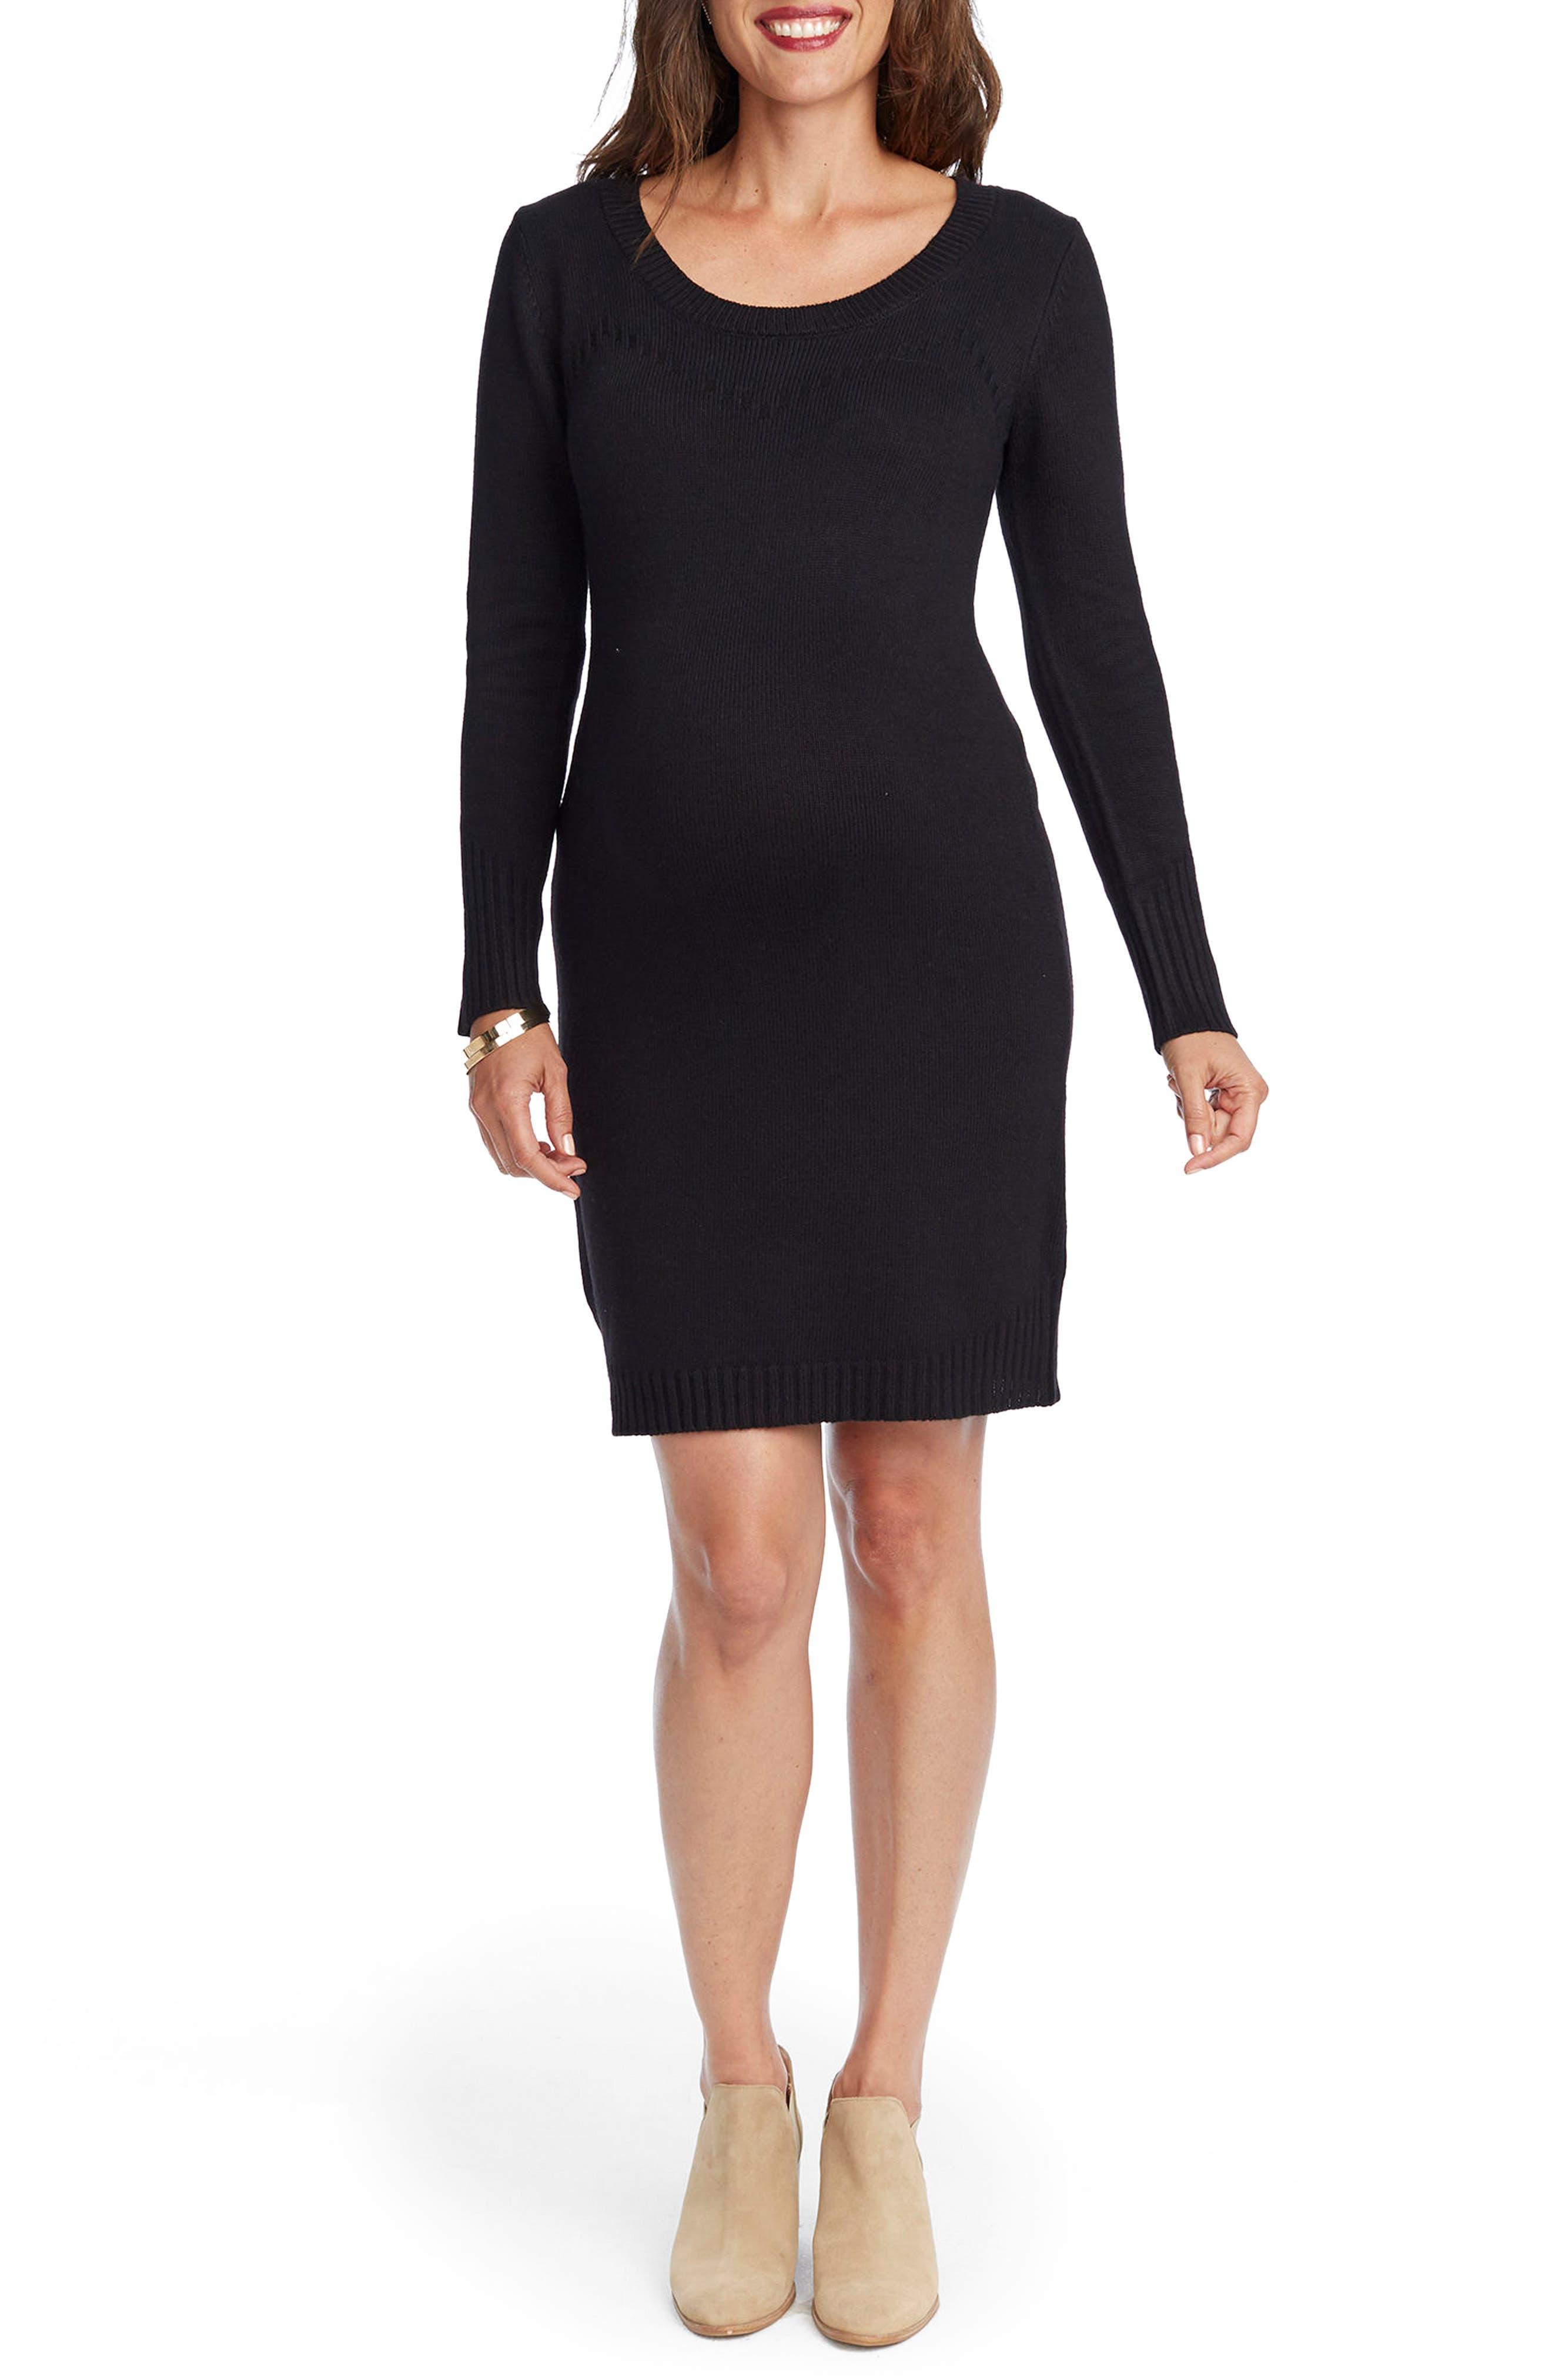 Rosie Pope Karlie Maternity Sweater Dress